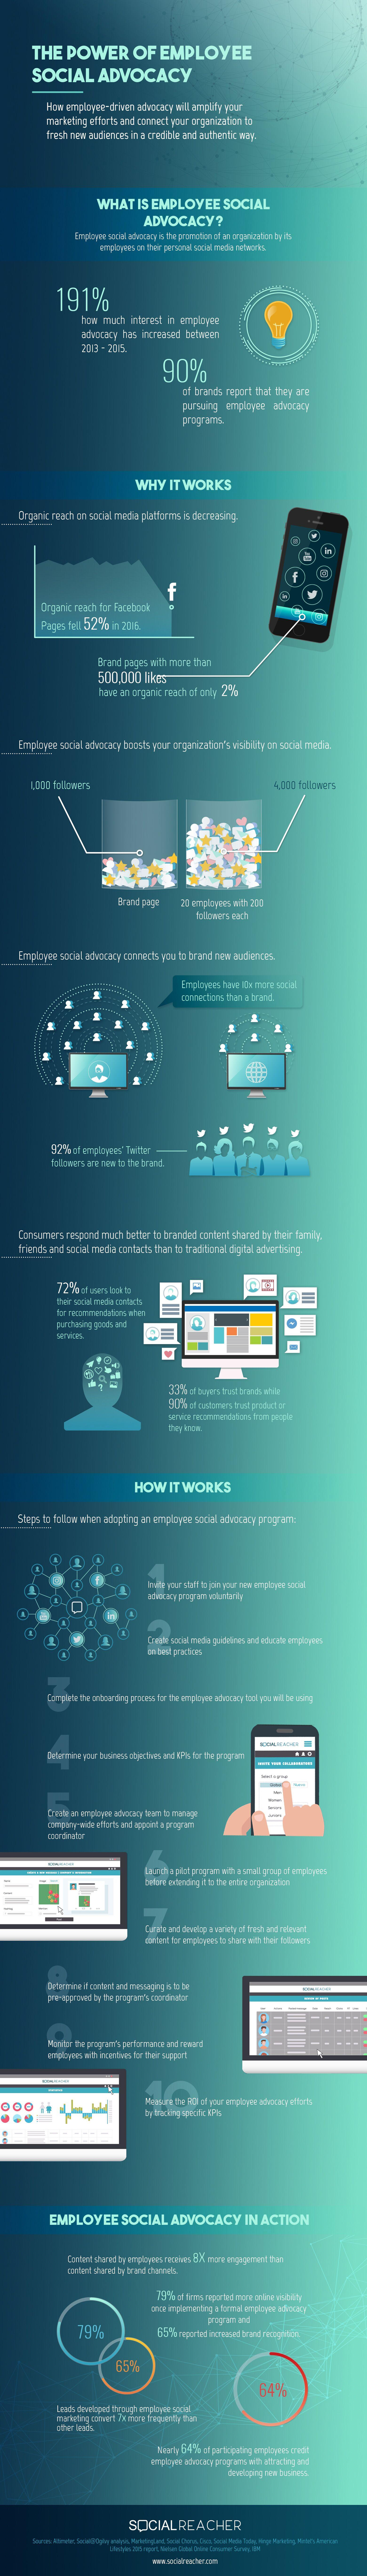 Infographic: Employee Social Media Advocacy